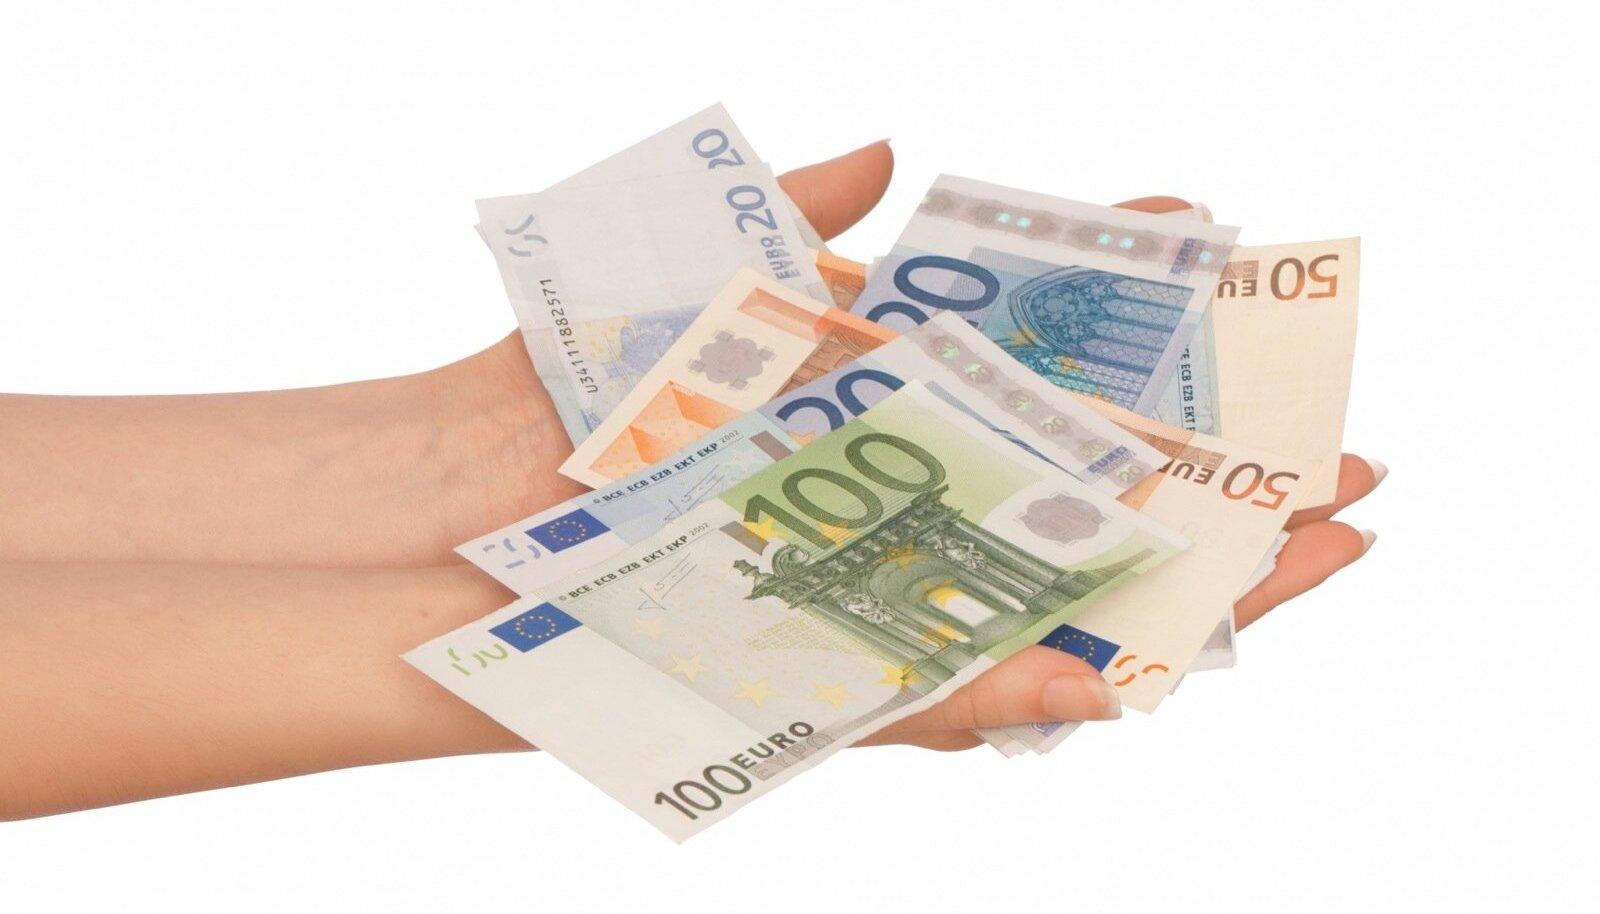 Raha jagamine